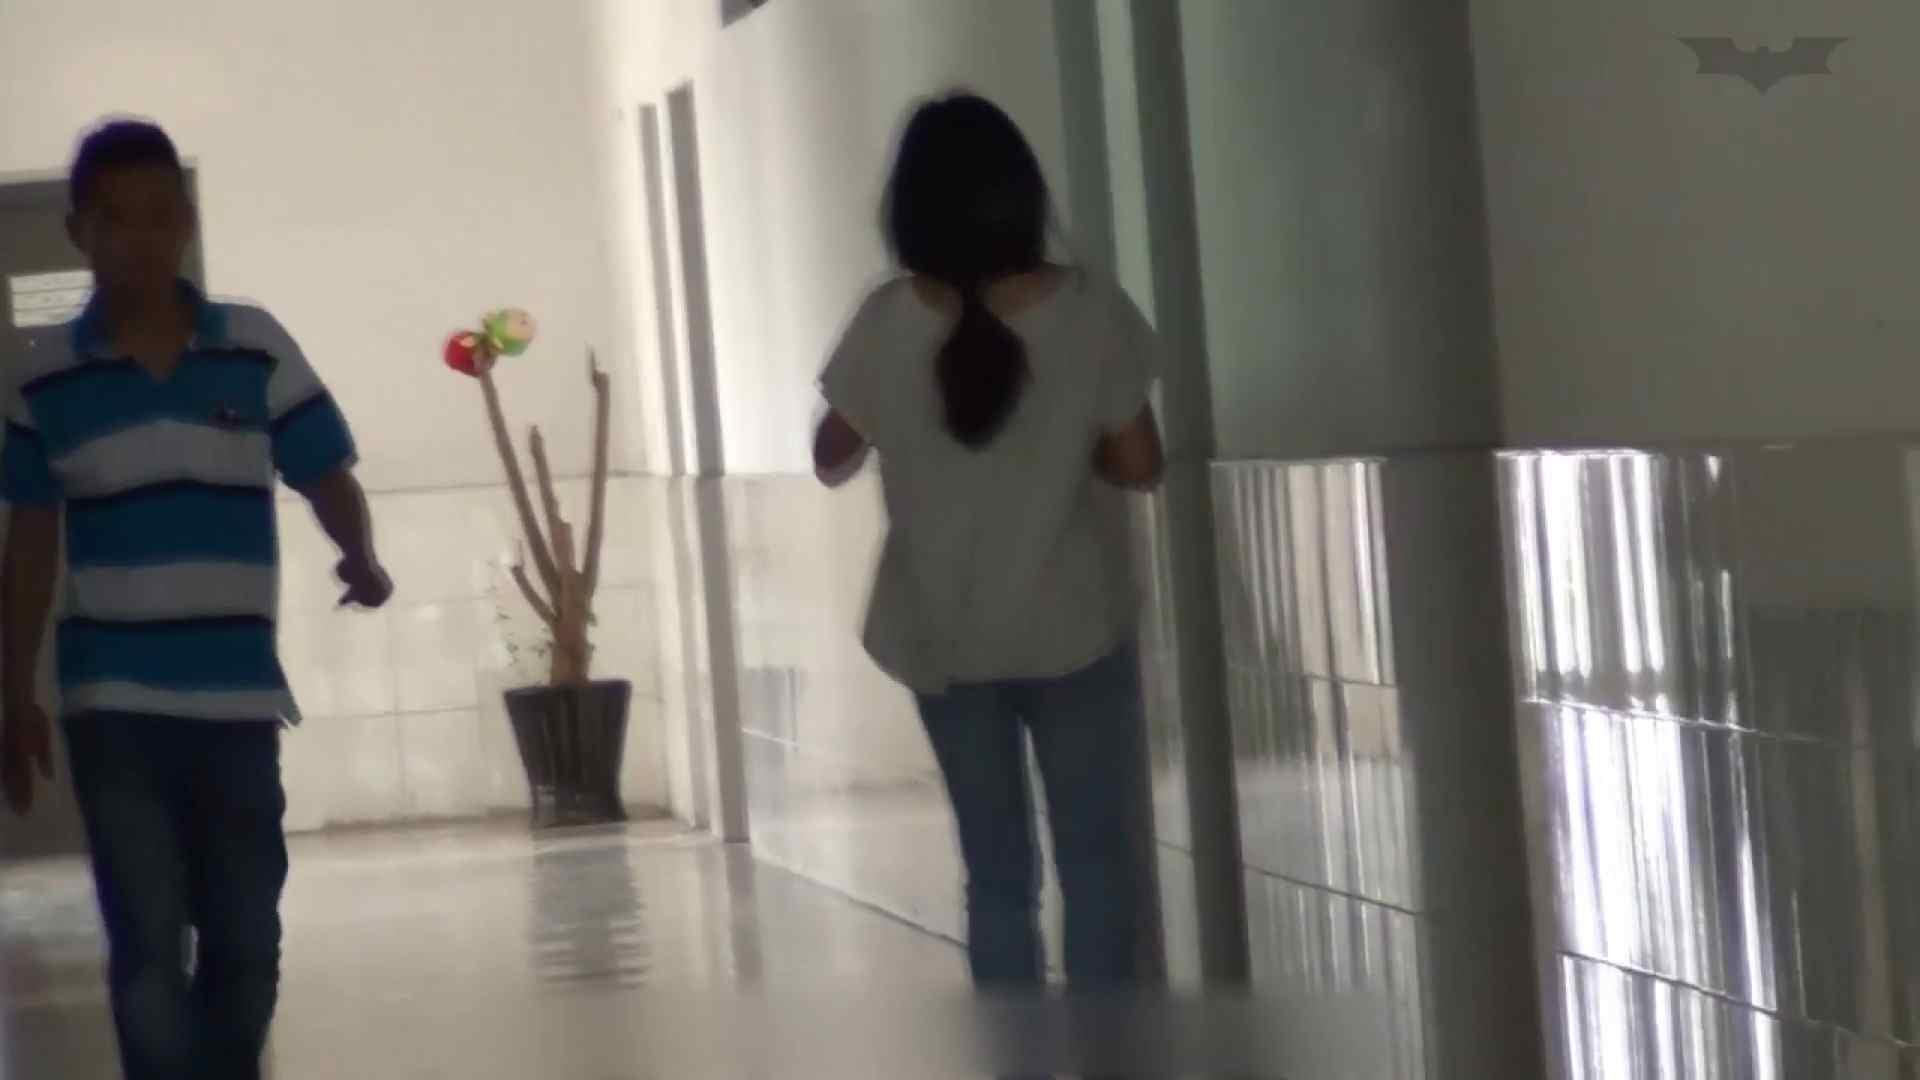 JD盗撮 美女の洗面所の秘密 Vol.50 盗撮 ぱこり動画紹介 71PIX 13